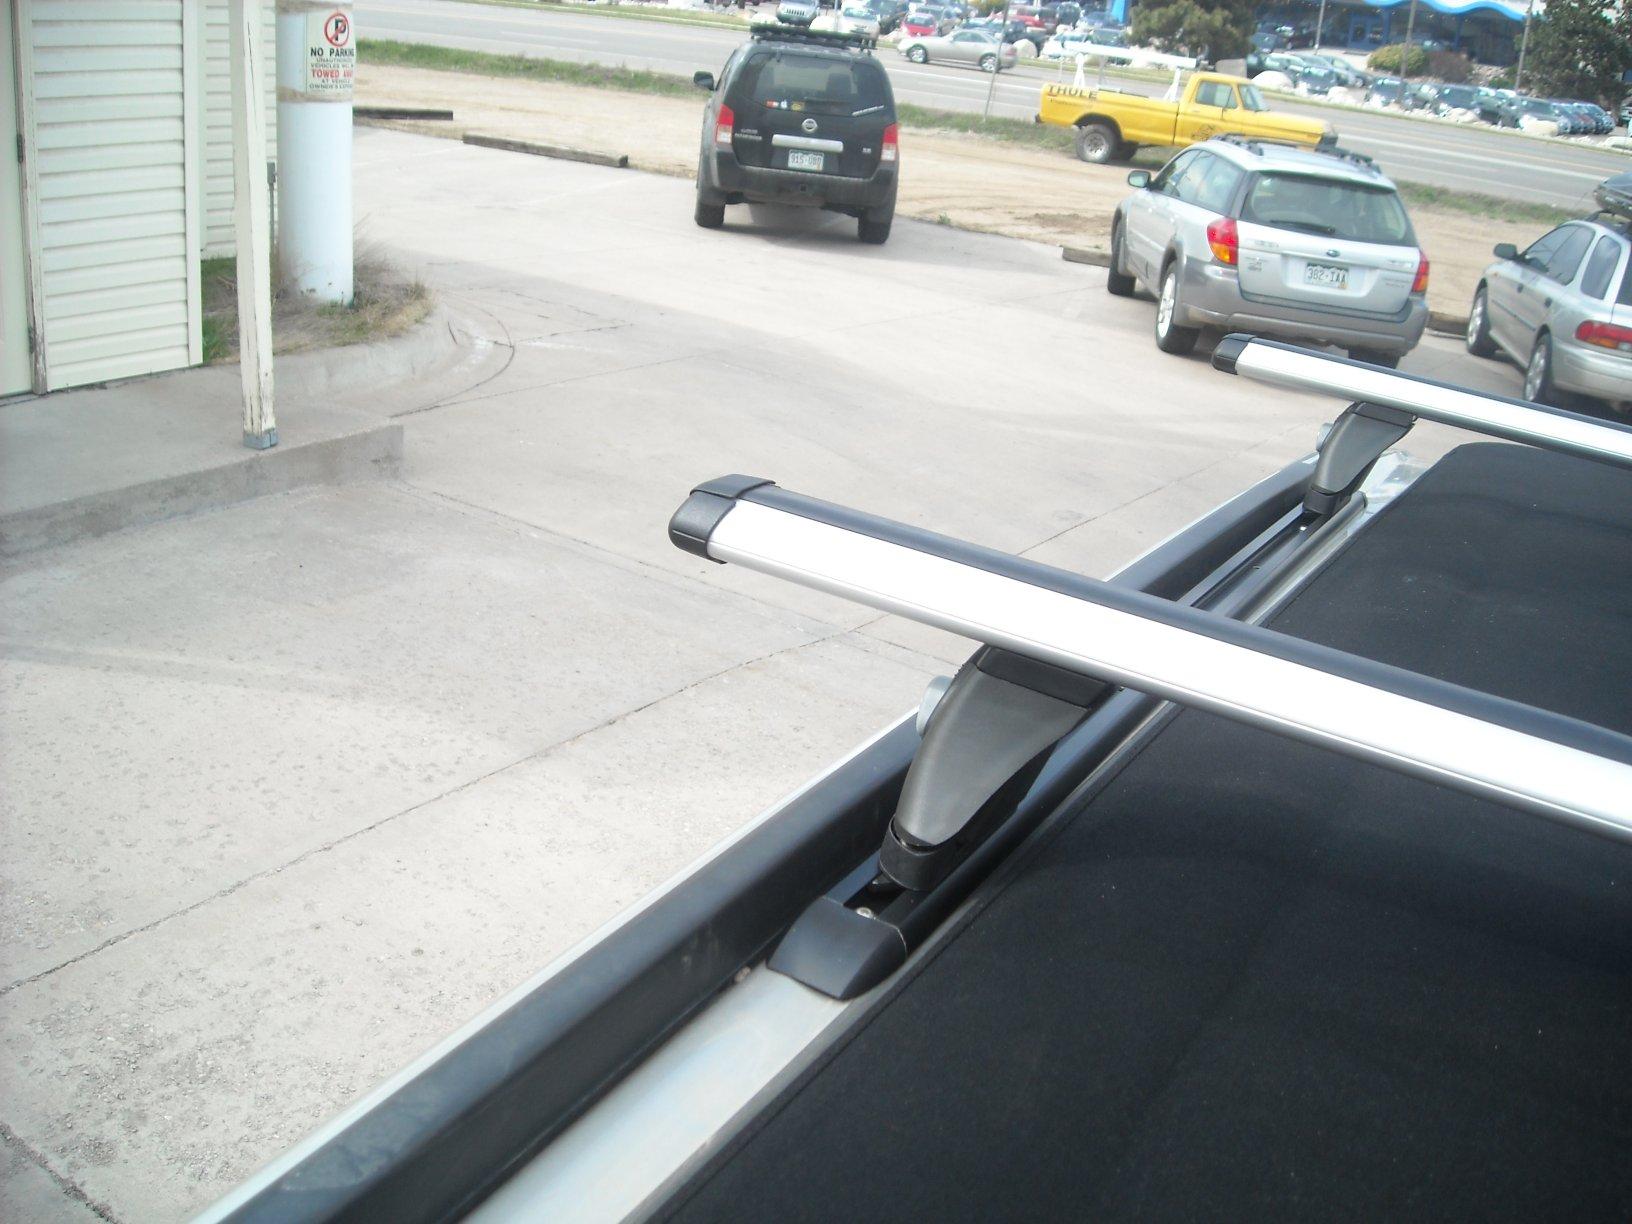 jeep-liberty-sky-slider-roof-trks-spirit-005.jpg